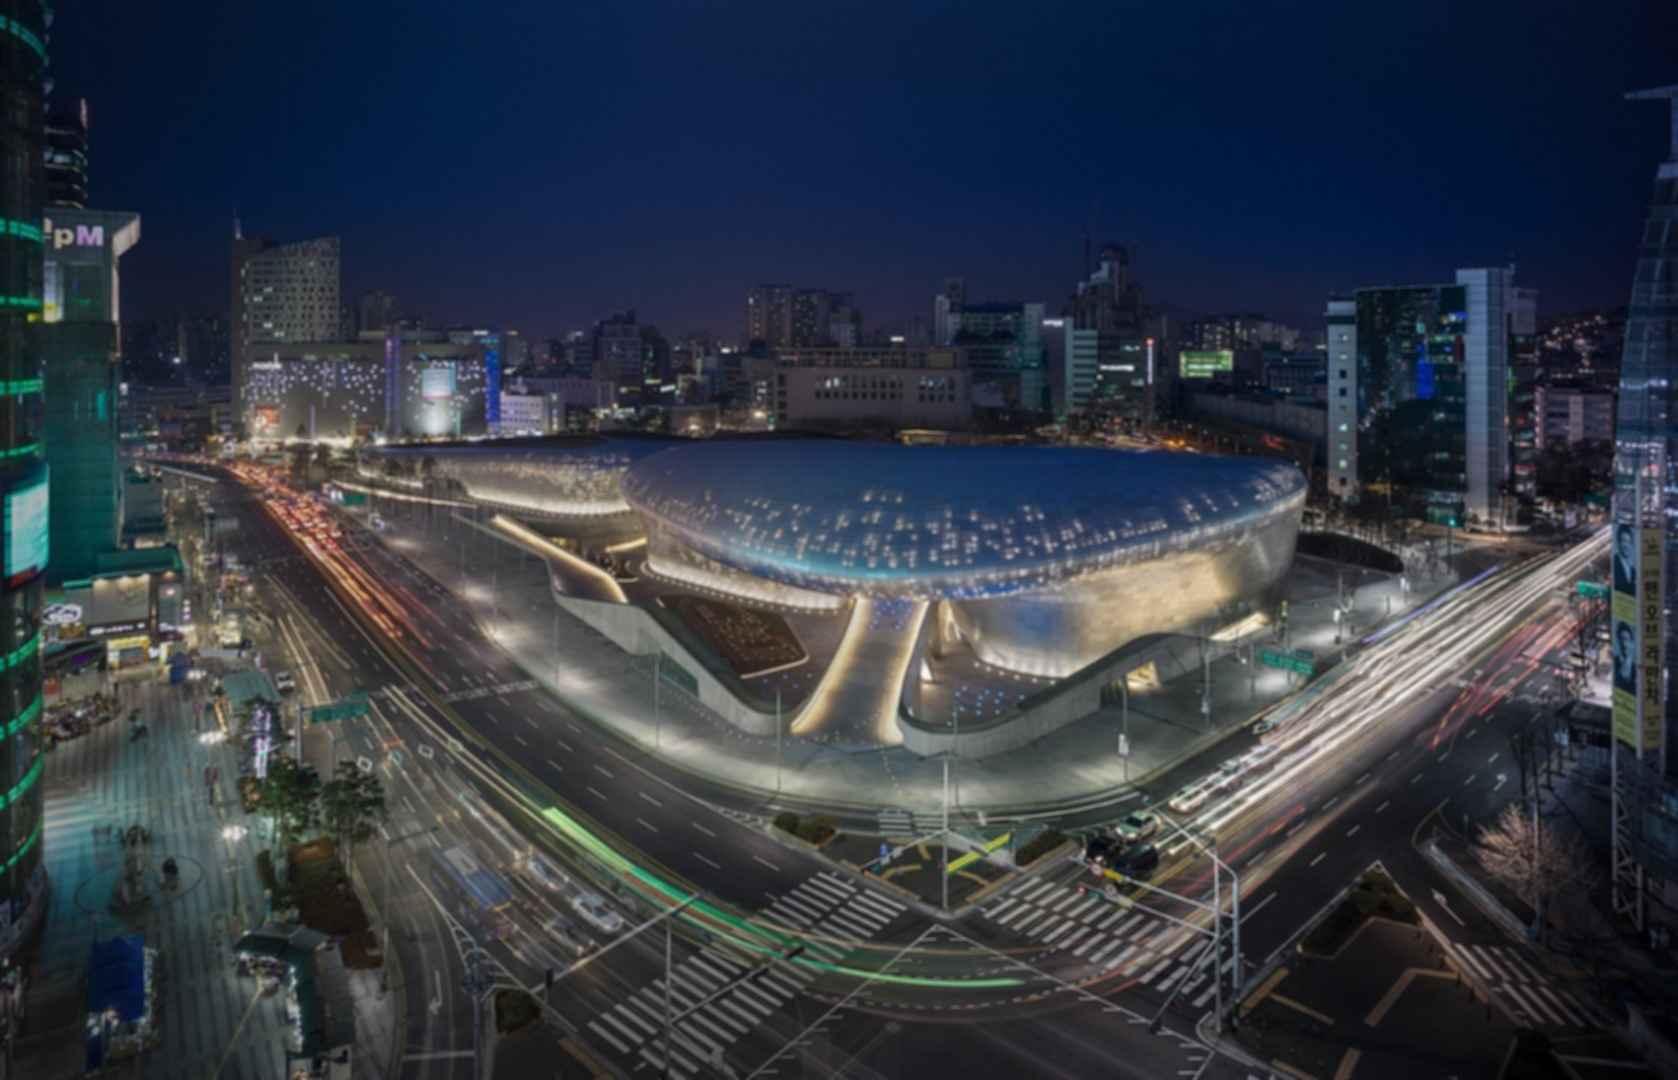 Dongdaemun Design Plaza - Exterior at Night